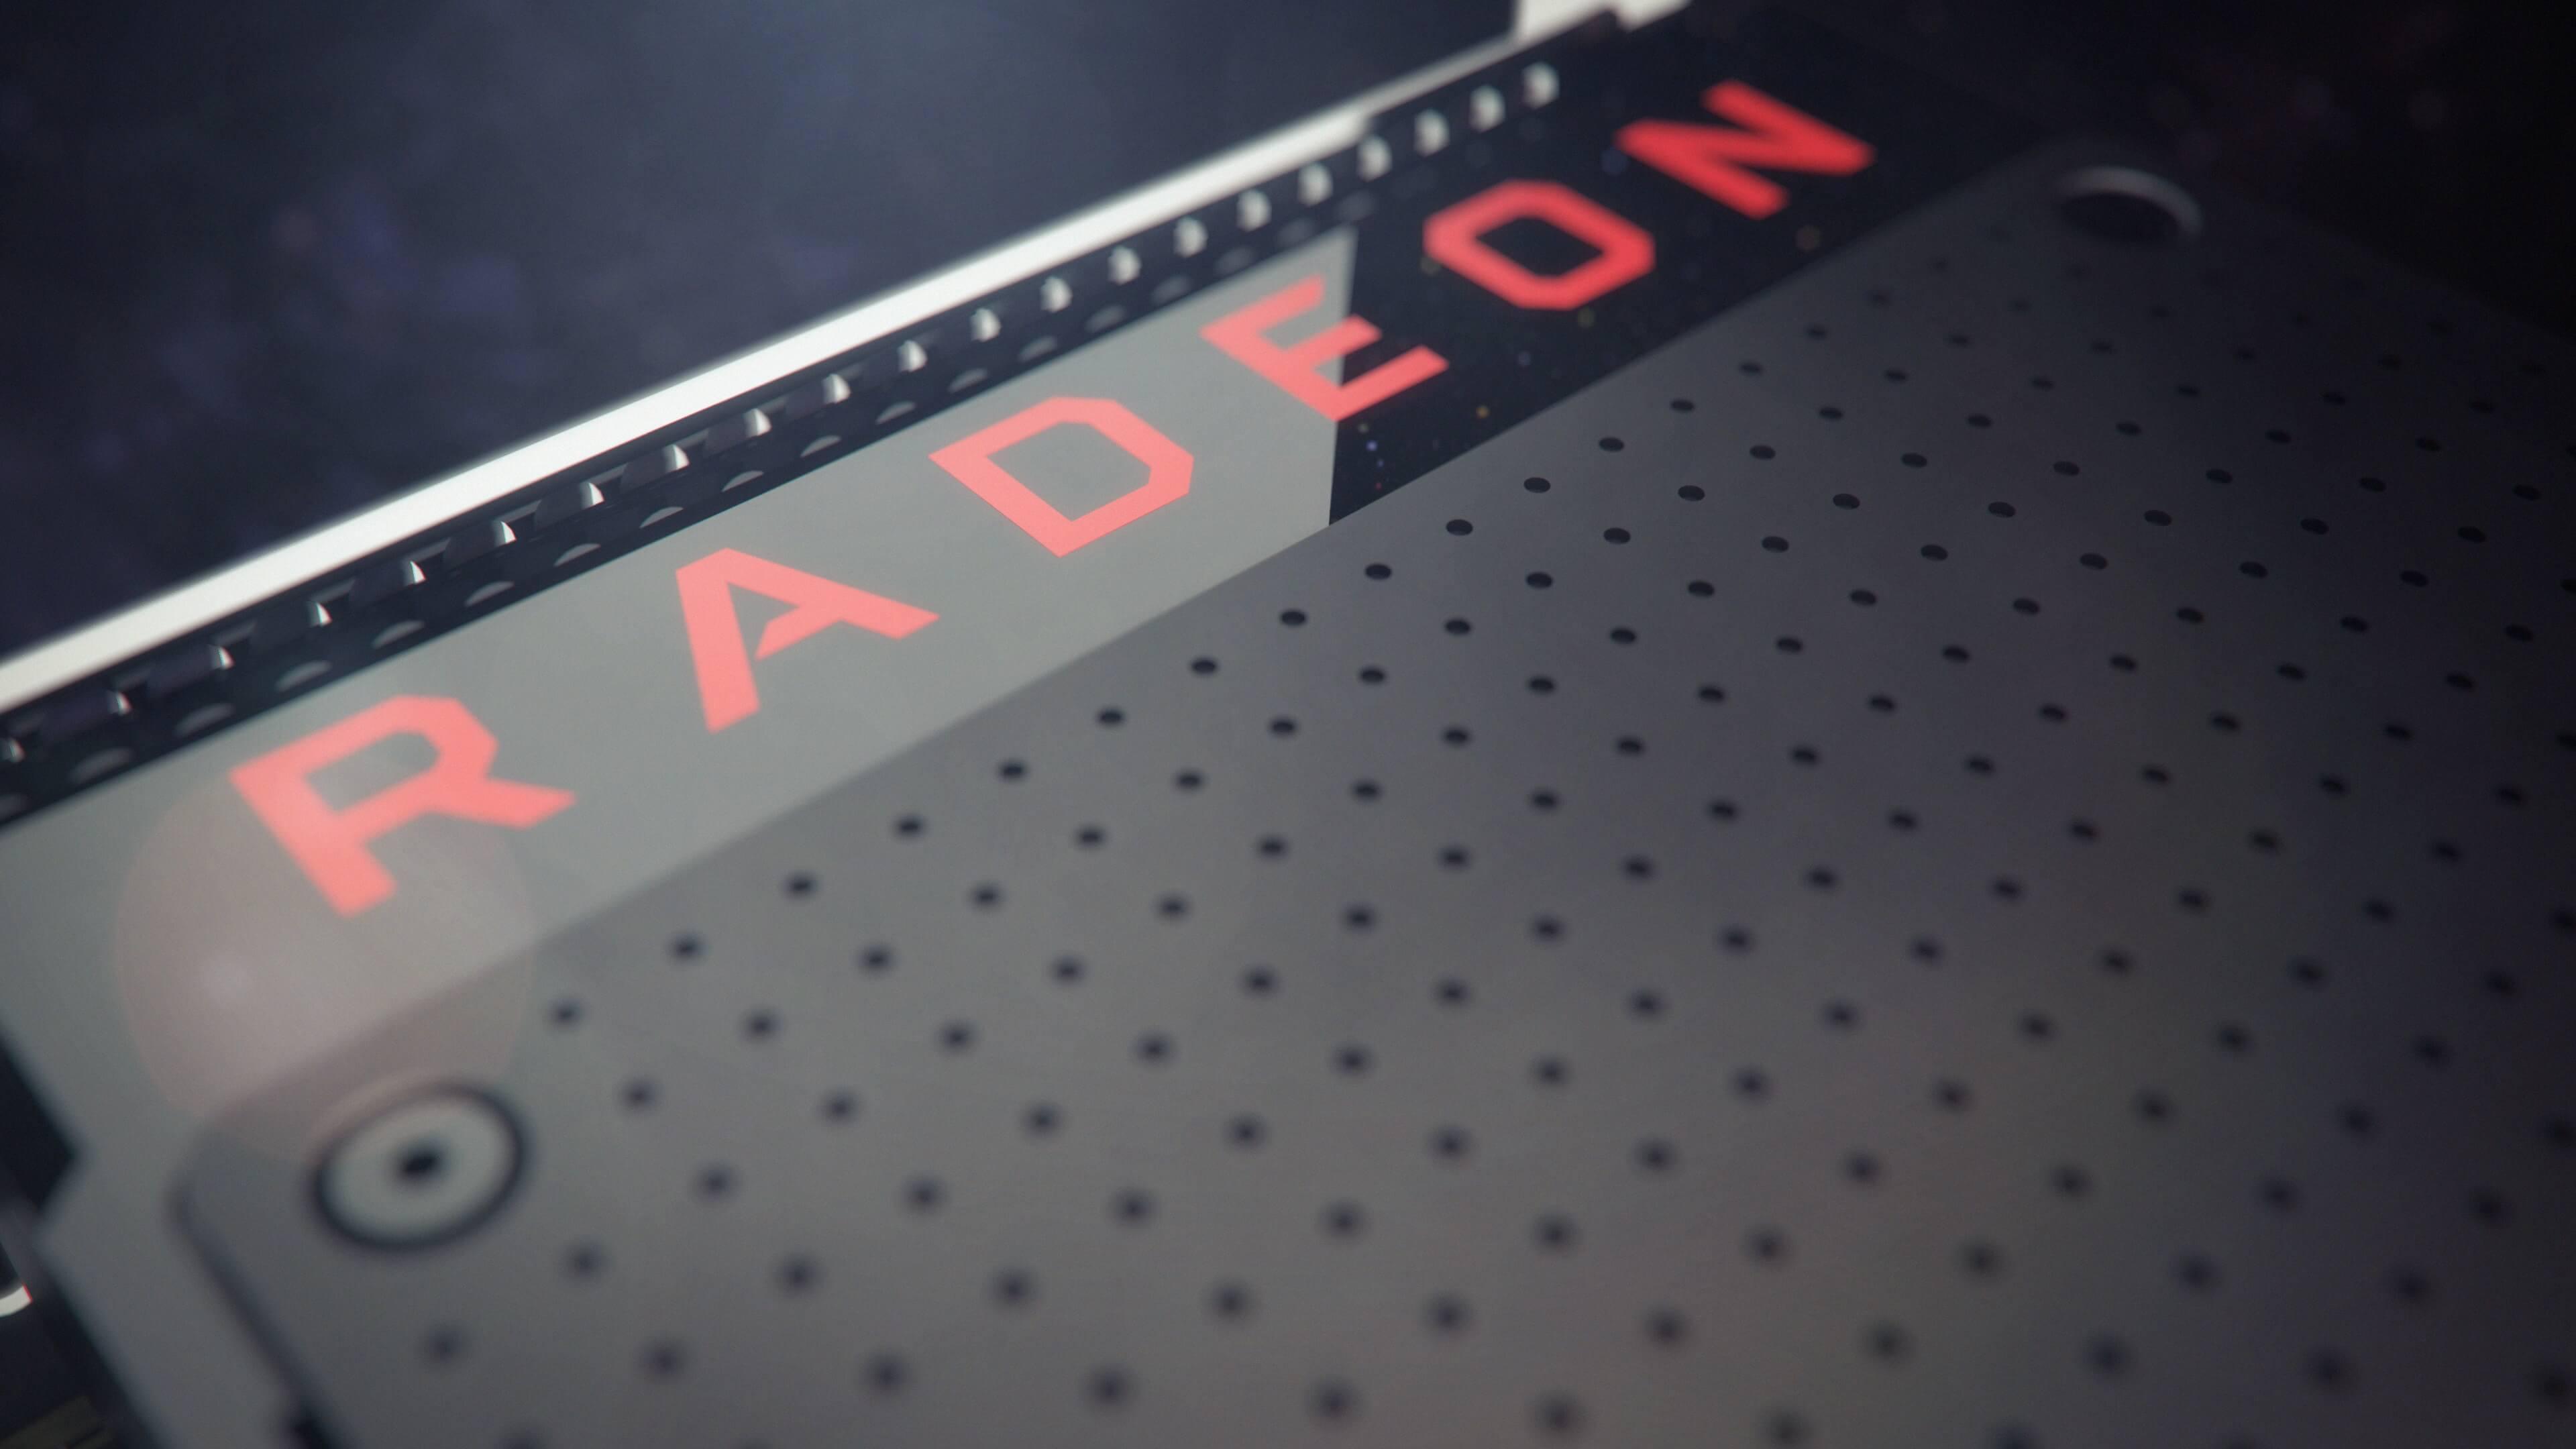 AMD prepares Ryzen 9 3900XT, Ryzen 7 3700XT and Ryzen 5 3600XT to hit Intel even harder